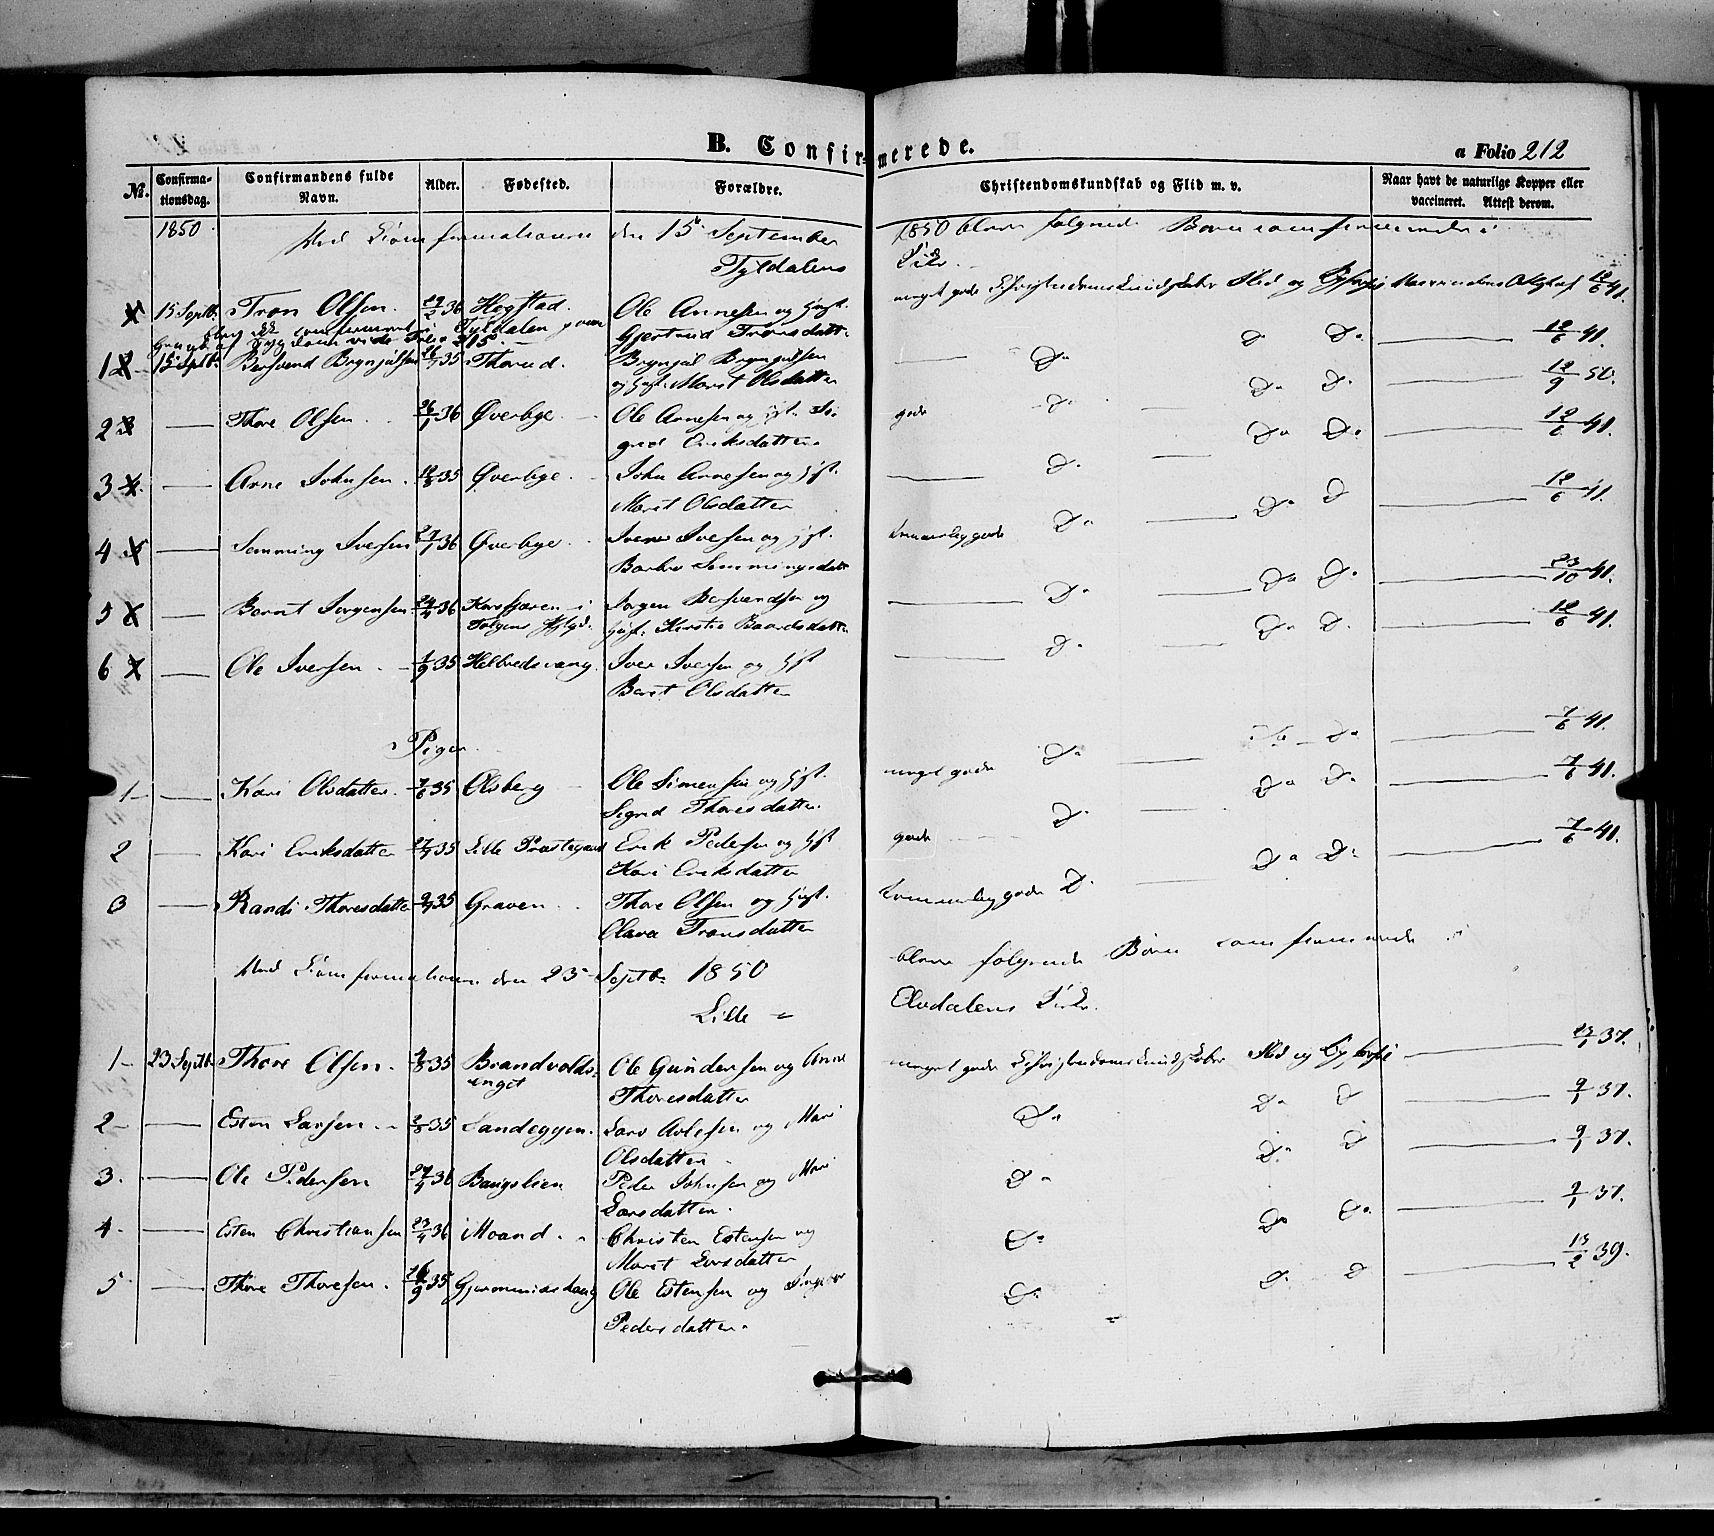 SAH, Tynset prestekontor, Ministerialbok nr. 20, 1848-1862, s. 212